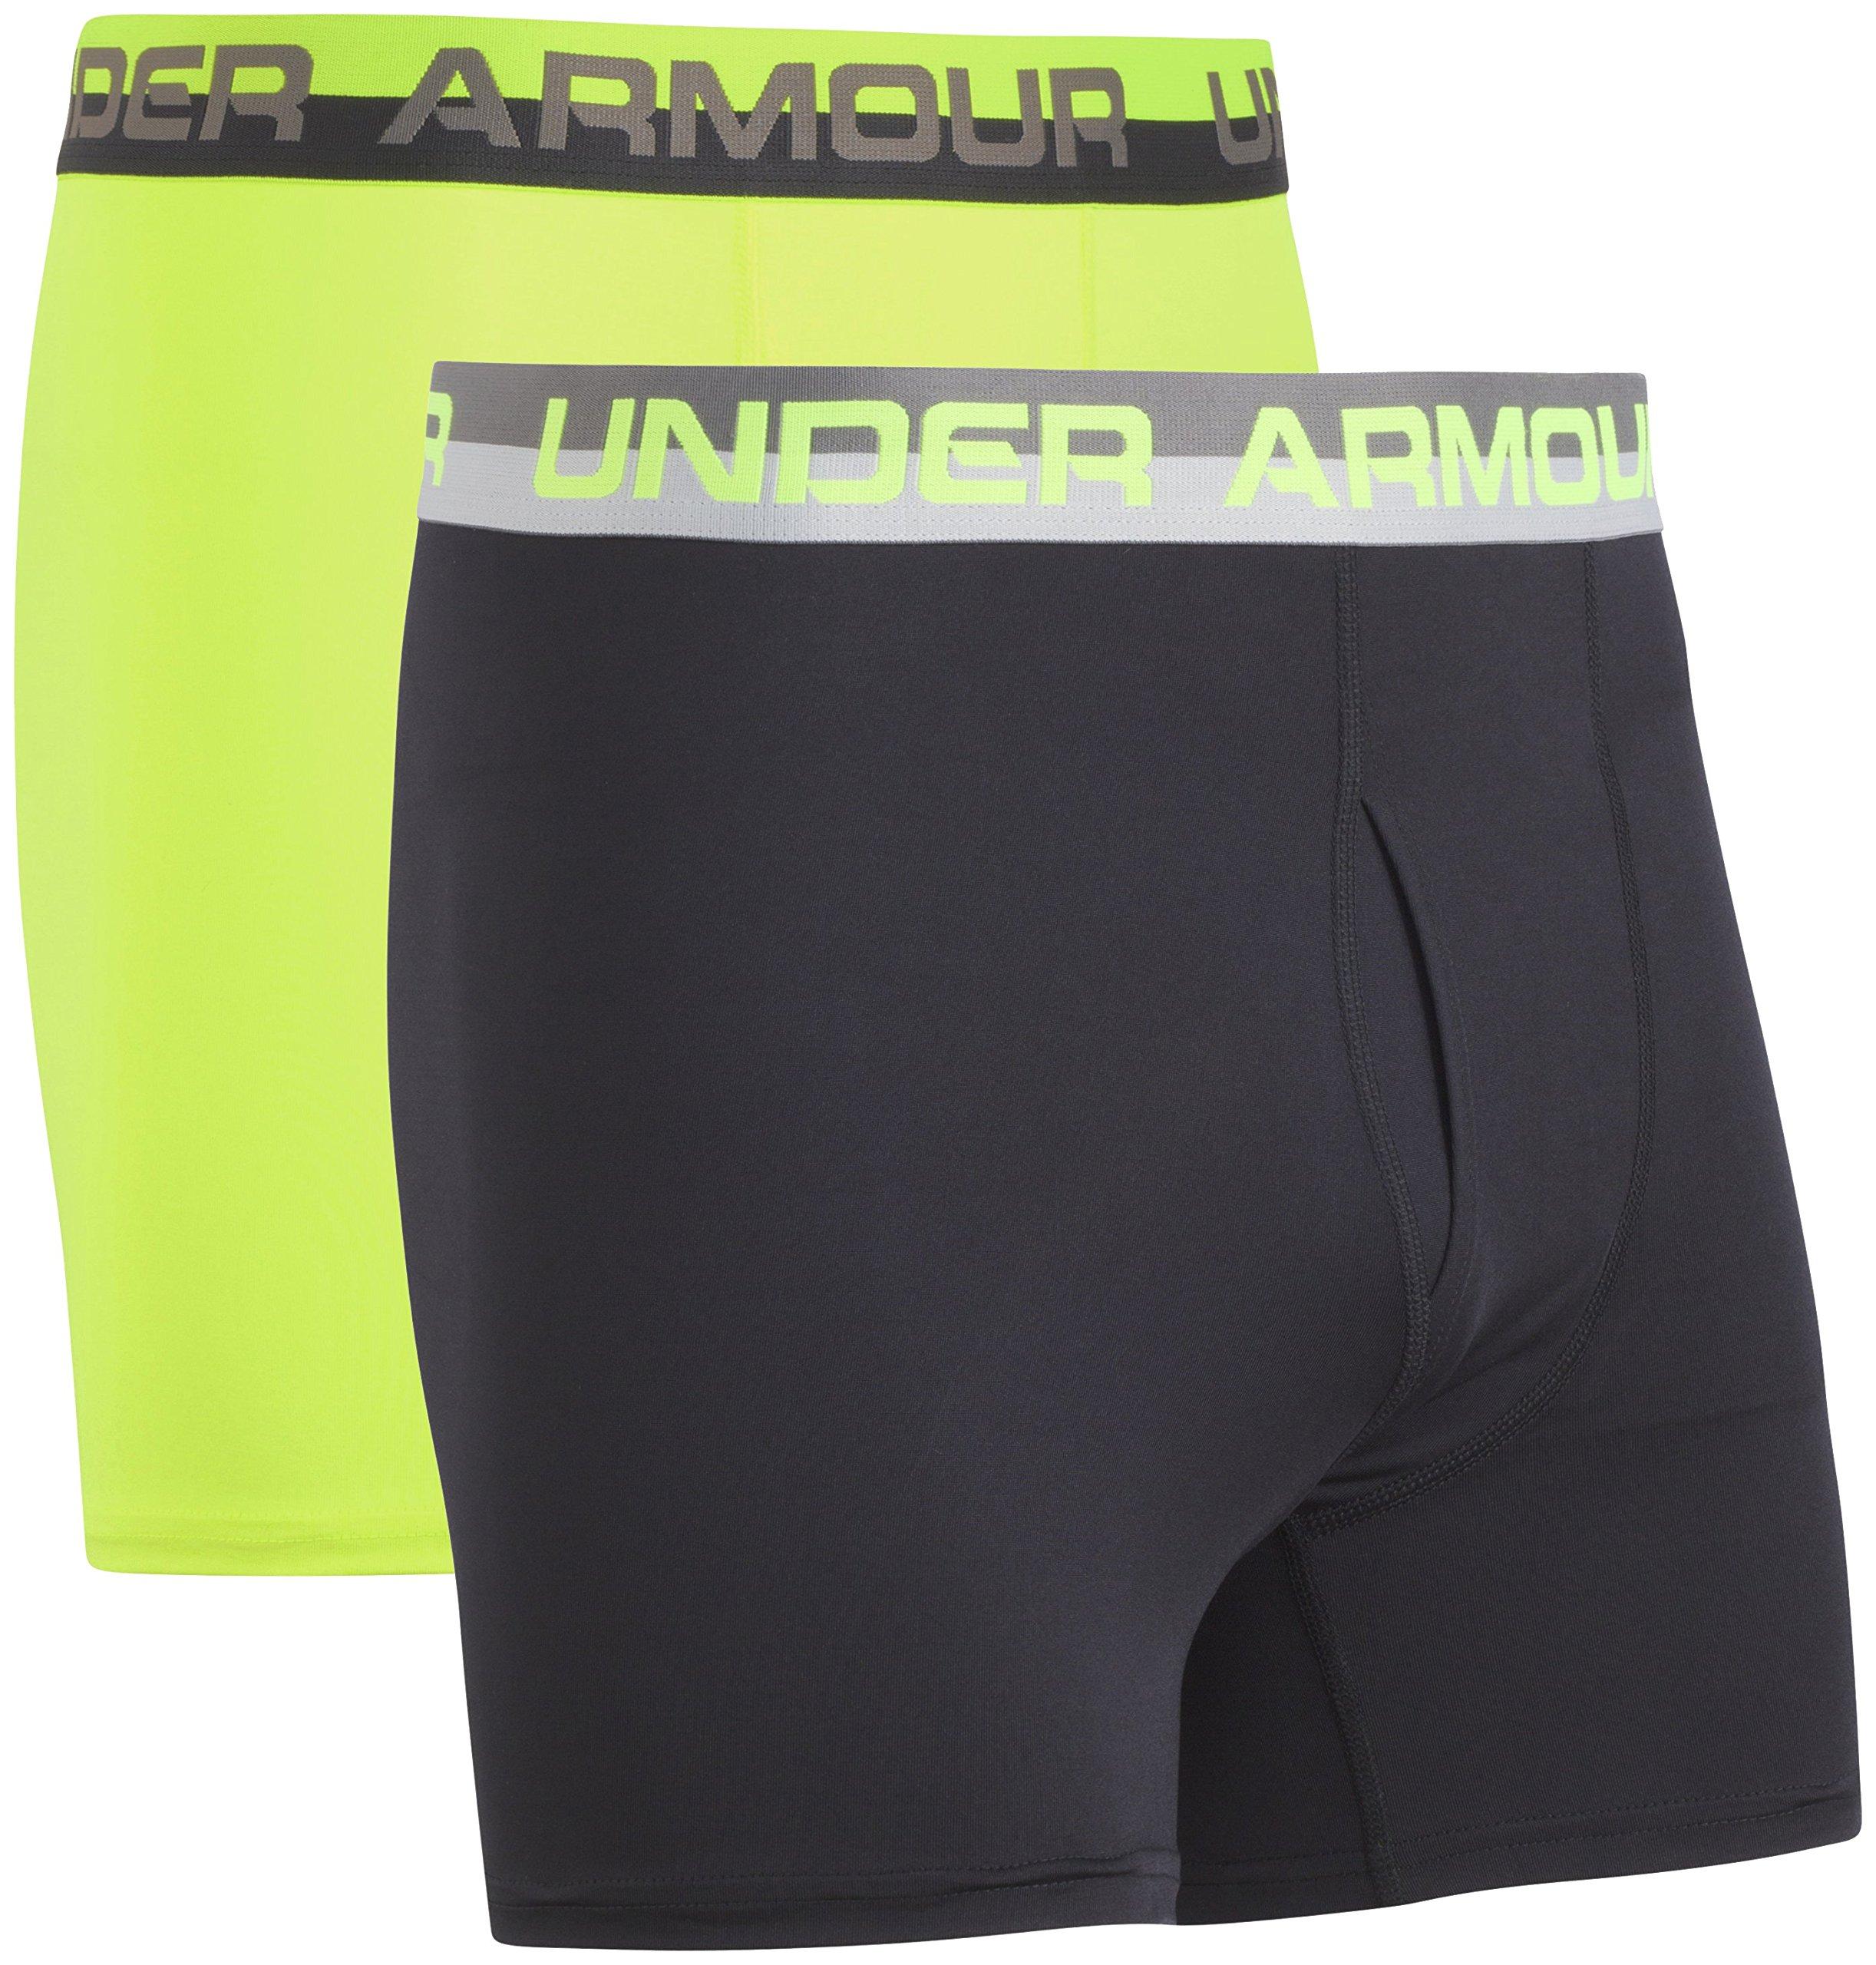 Under Armour Big Boys' 2 Pack Performance Boxer Briefs, Hi Gh/Vis Yellow/Black, YXS